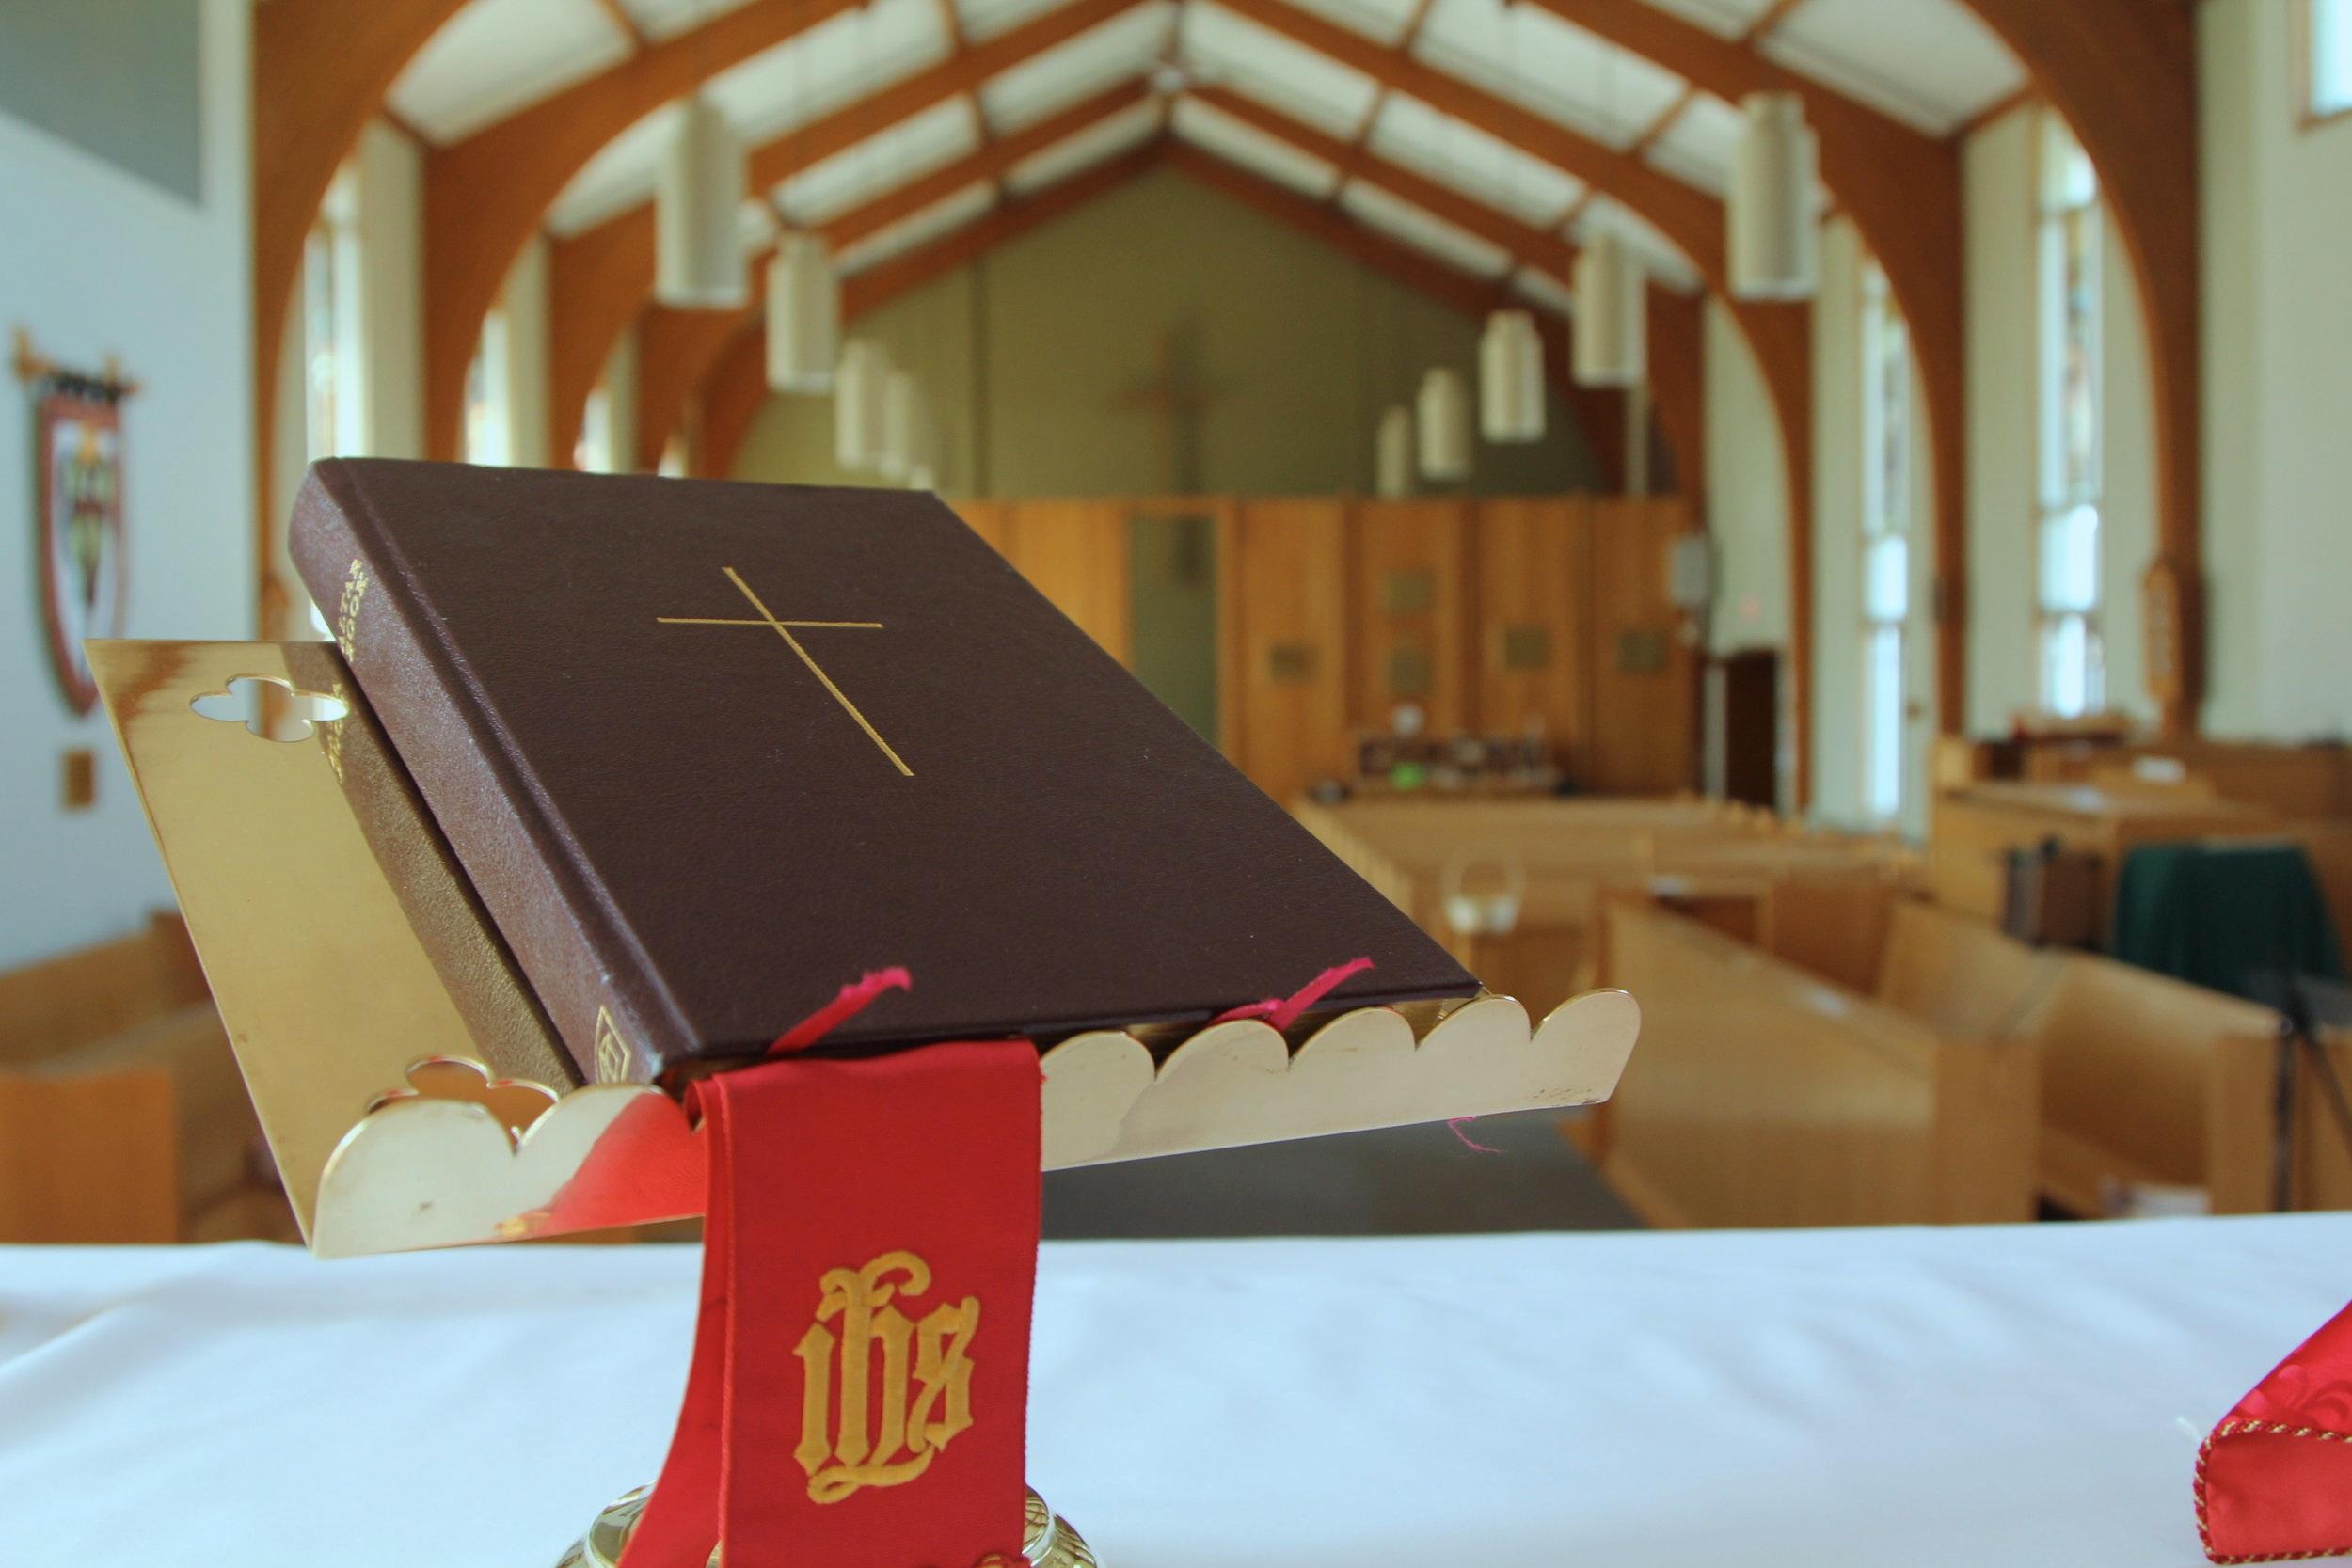 christ church seaway - SUNDAYS8:00 AM Eucharist* 10:00 AM EucharistWEDNESDAYS10:30 AM Eucharist (September - May)* Book of Common Prayer